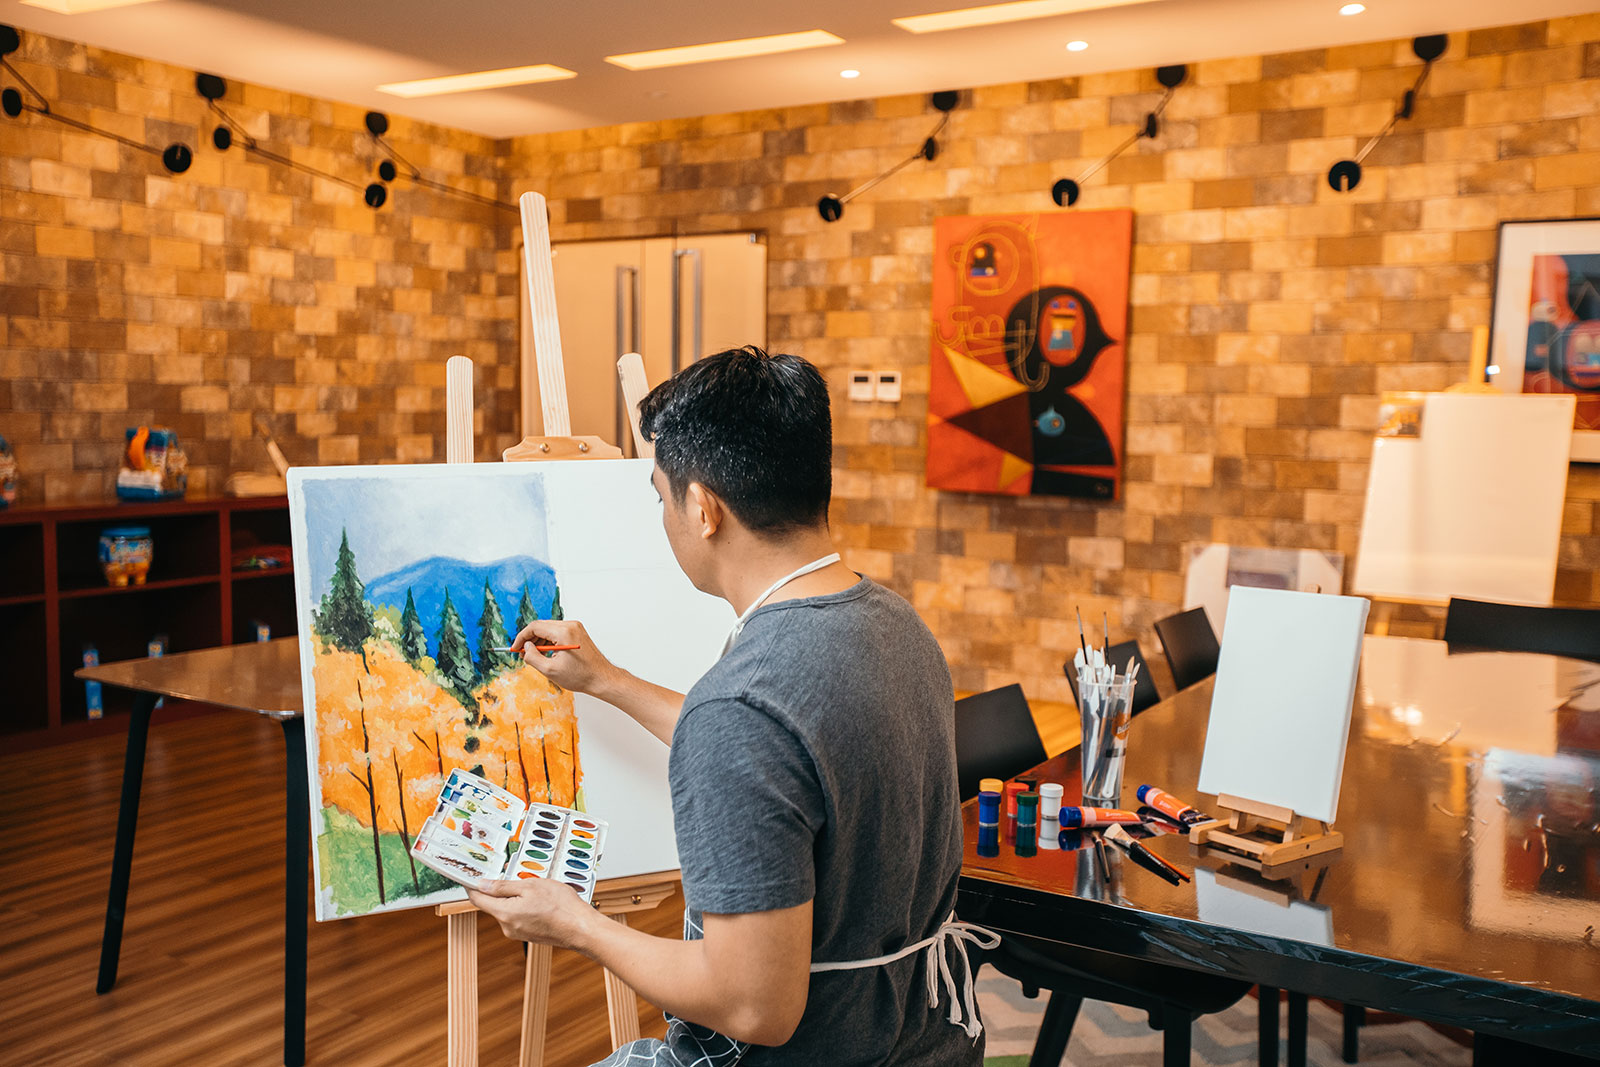 Arts And Crafts Studio